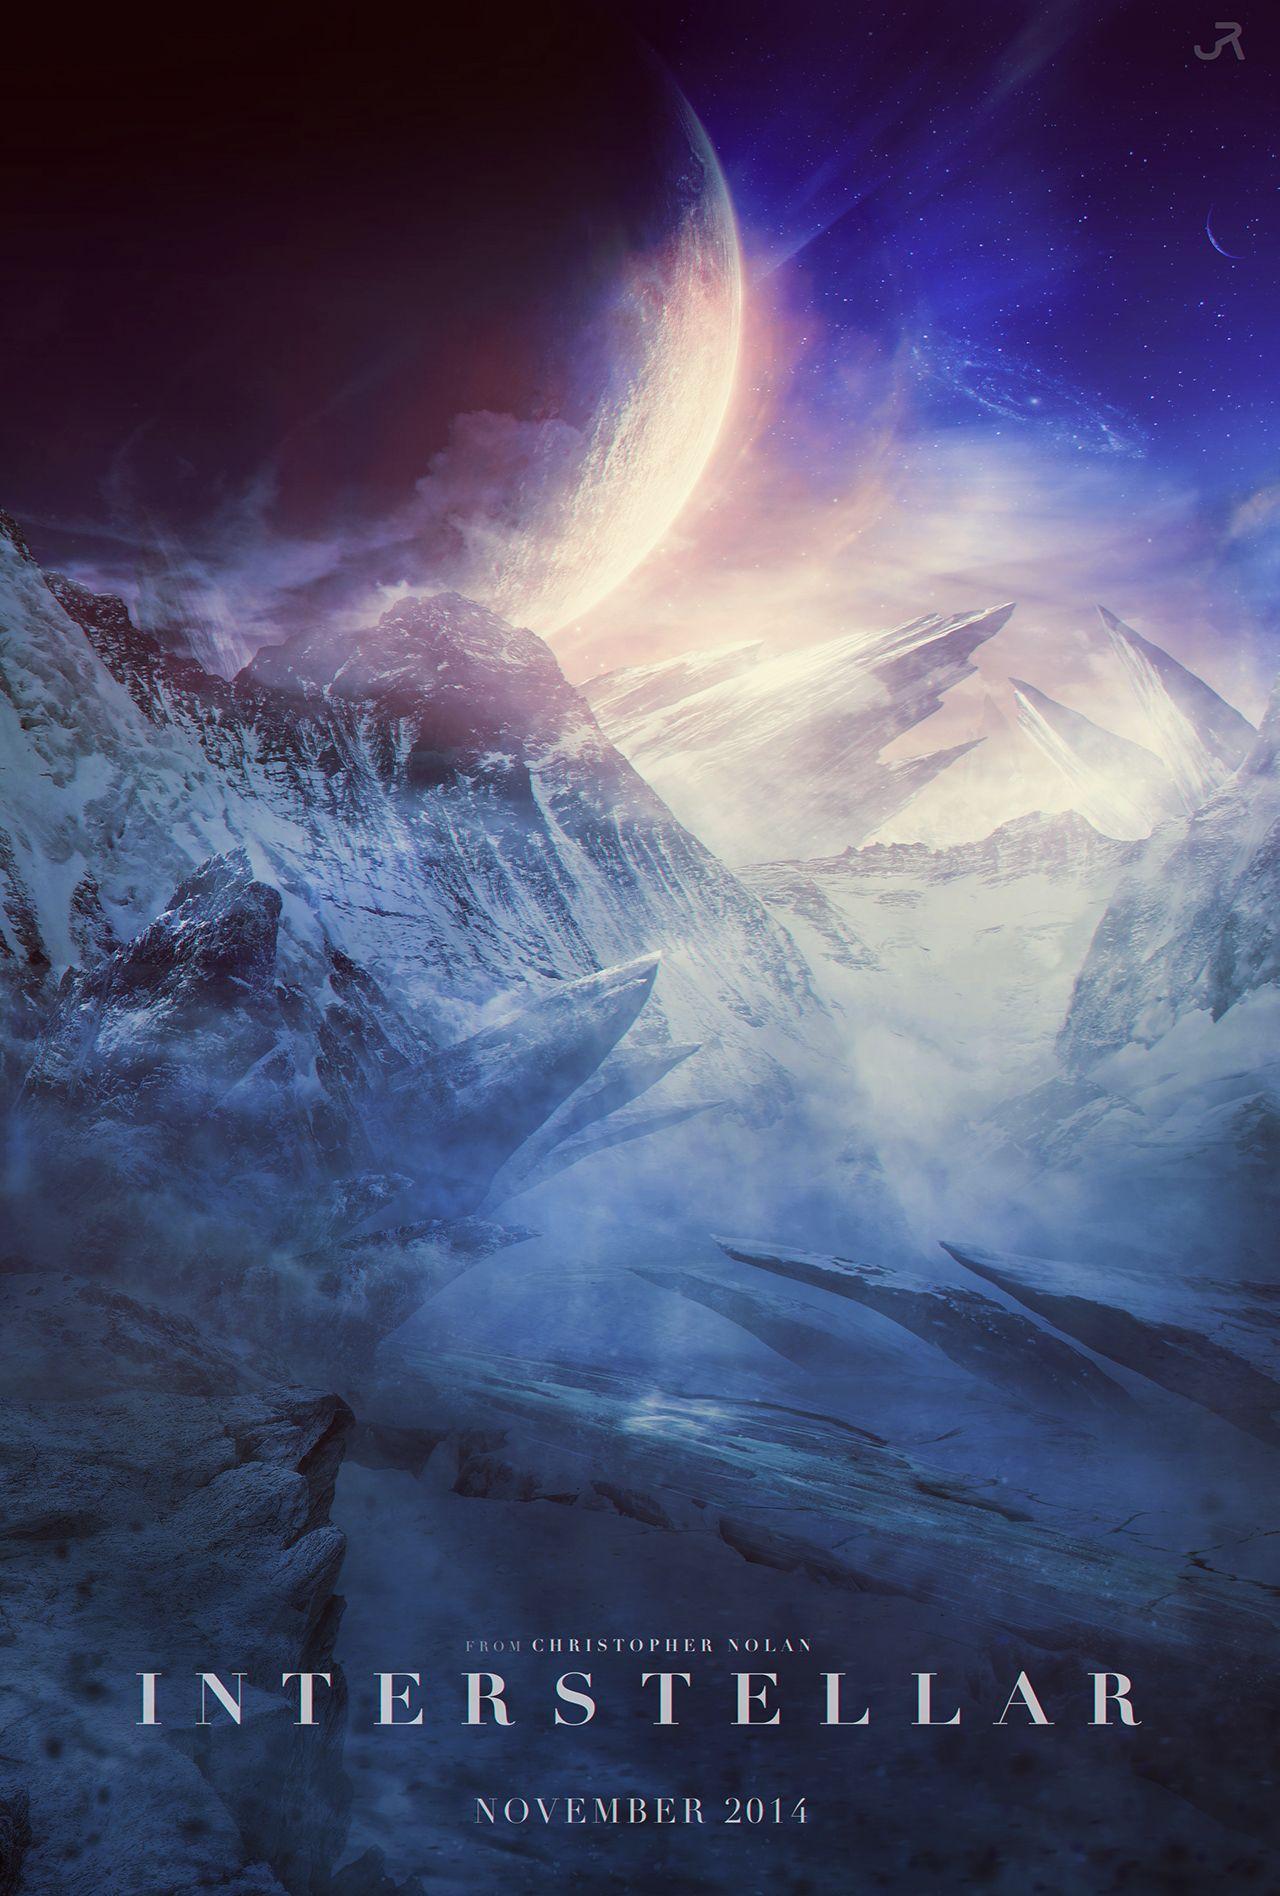 Interstellar Planet Scenery Poster 02 Interstellar Movie Interstellar Interstellar Posters